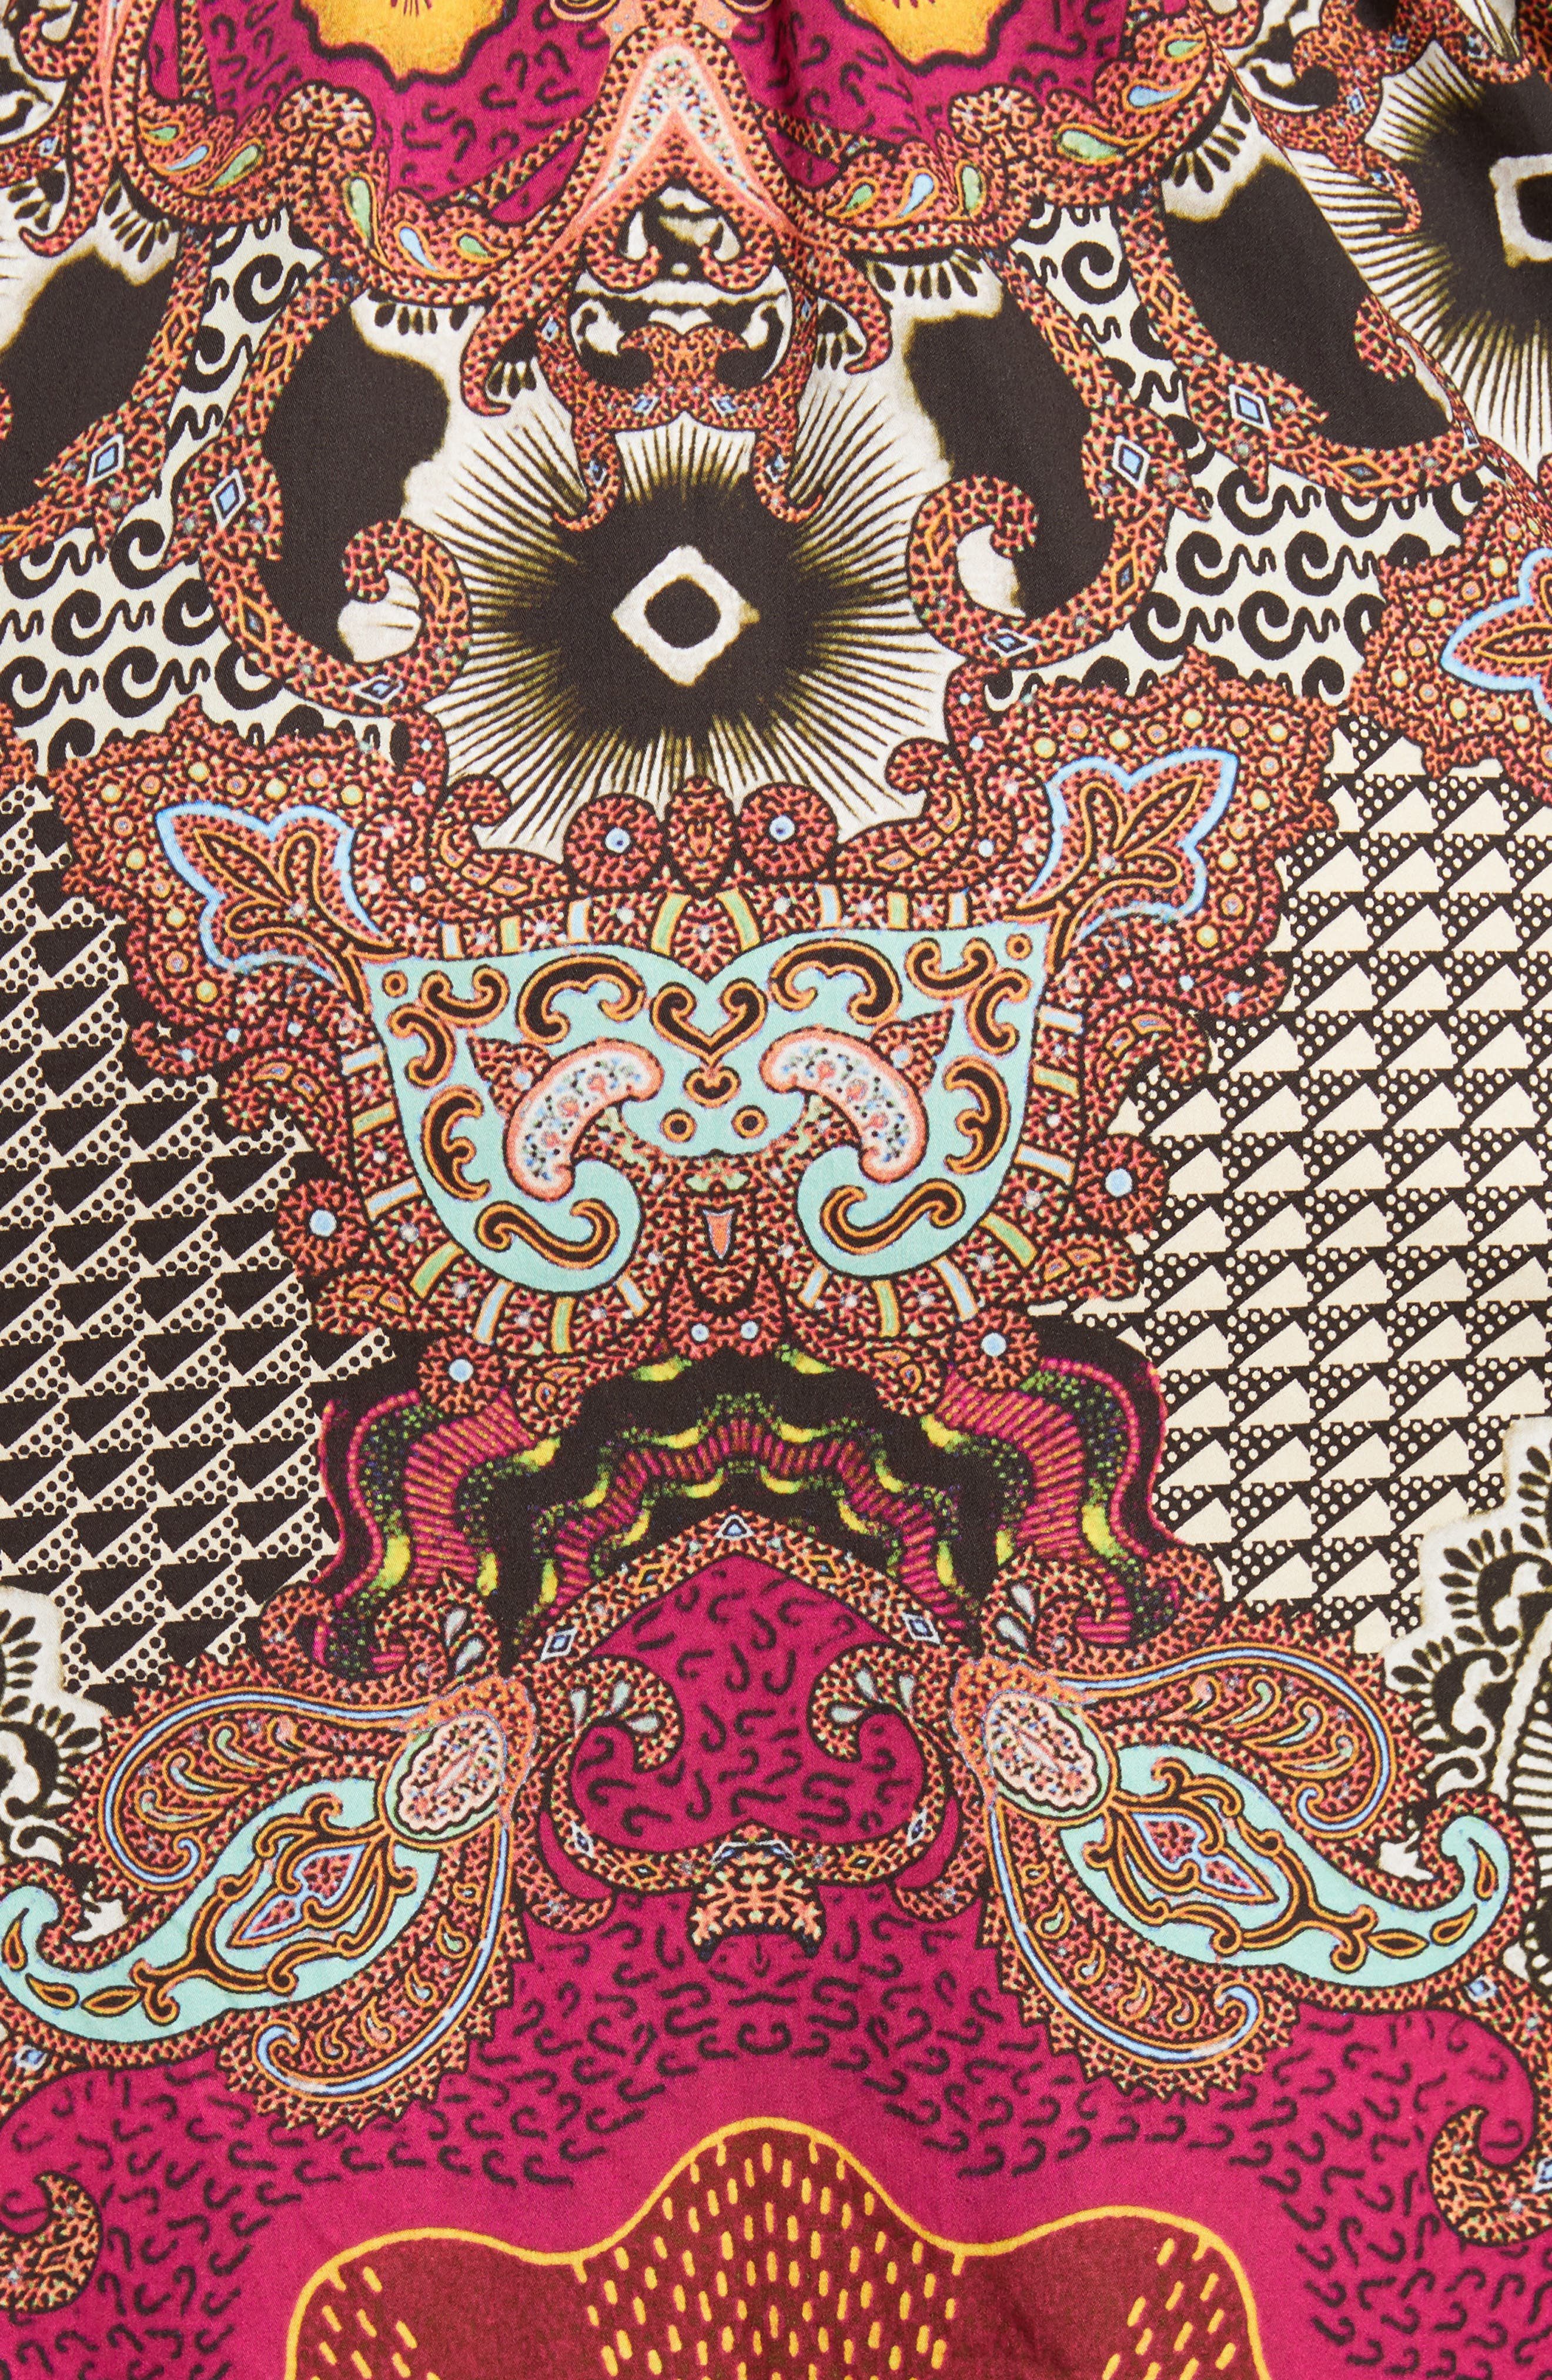 Jungle Paisley Print Cotton Dress,                             Alternate thumbnail 5, color,                             002